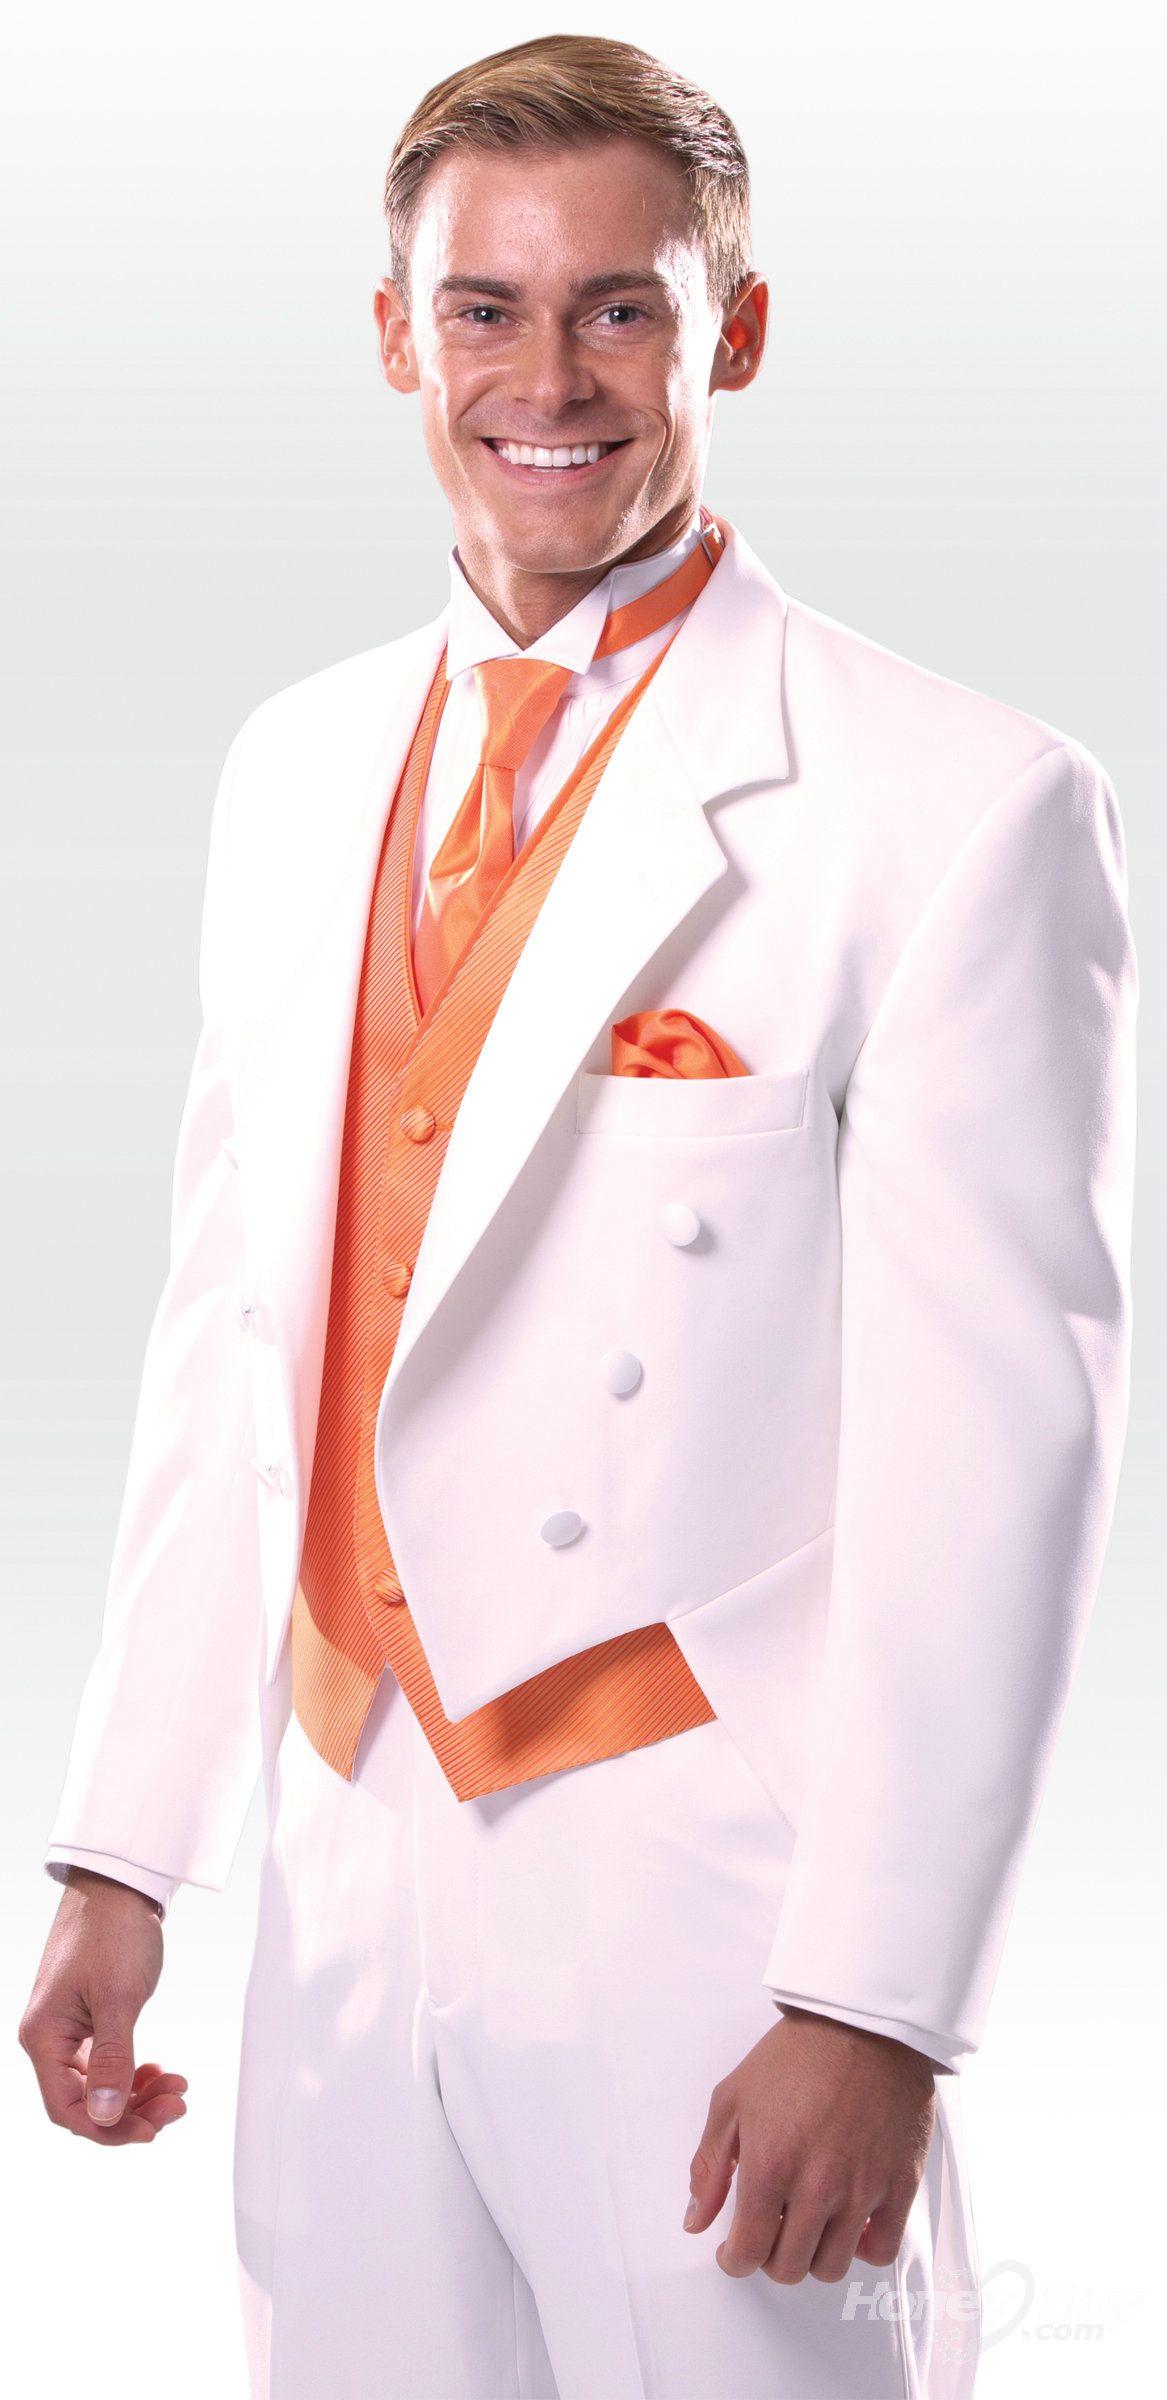 White Tail Coat Tuxedo White prom suits for men